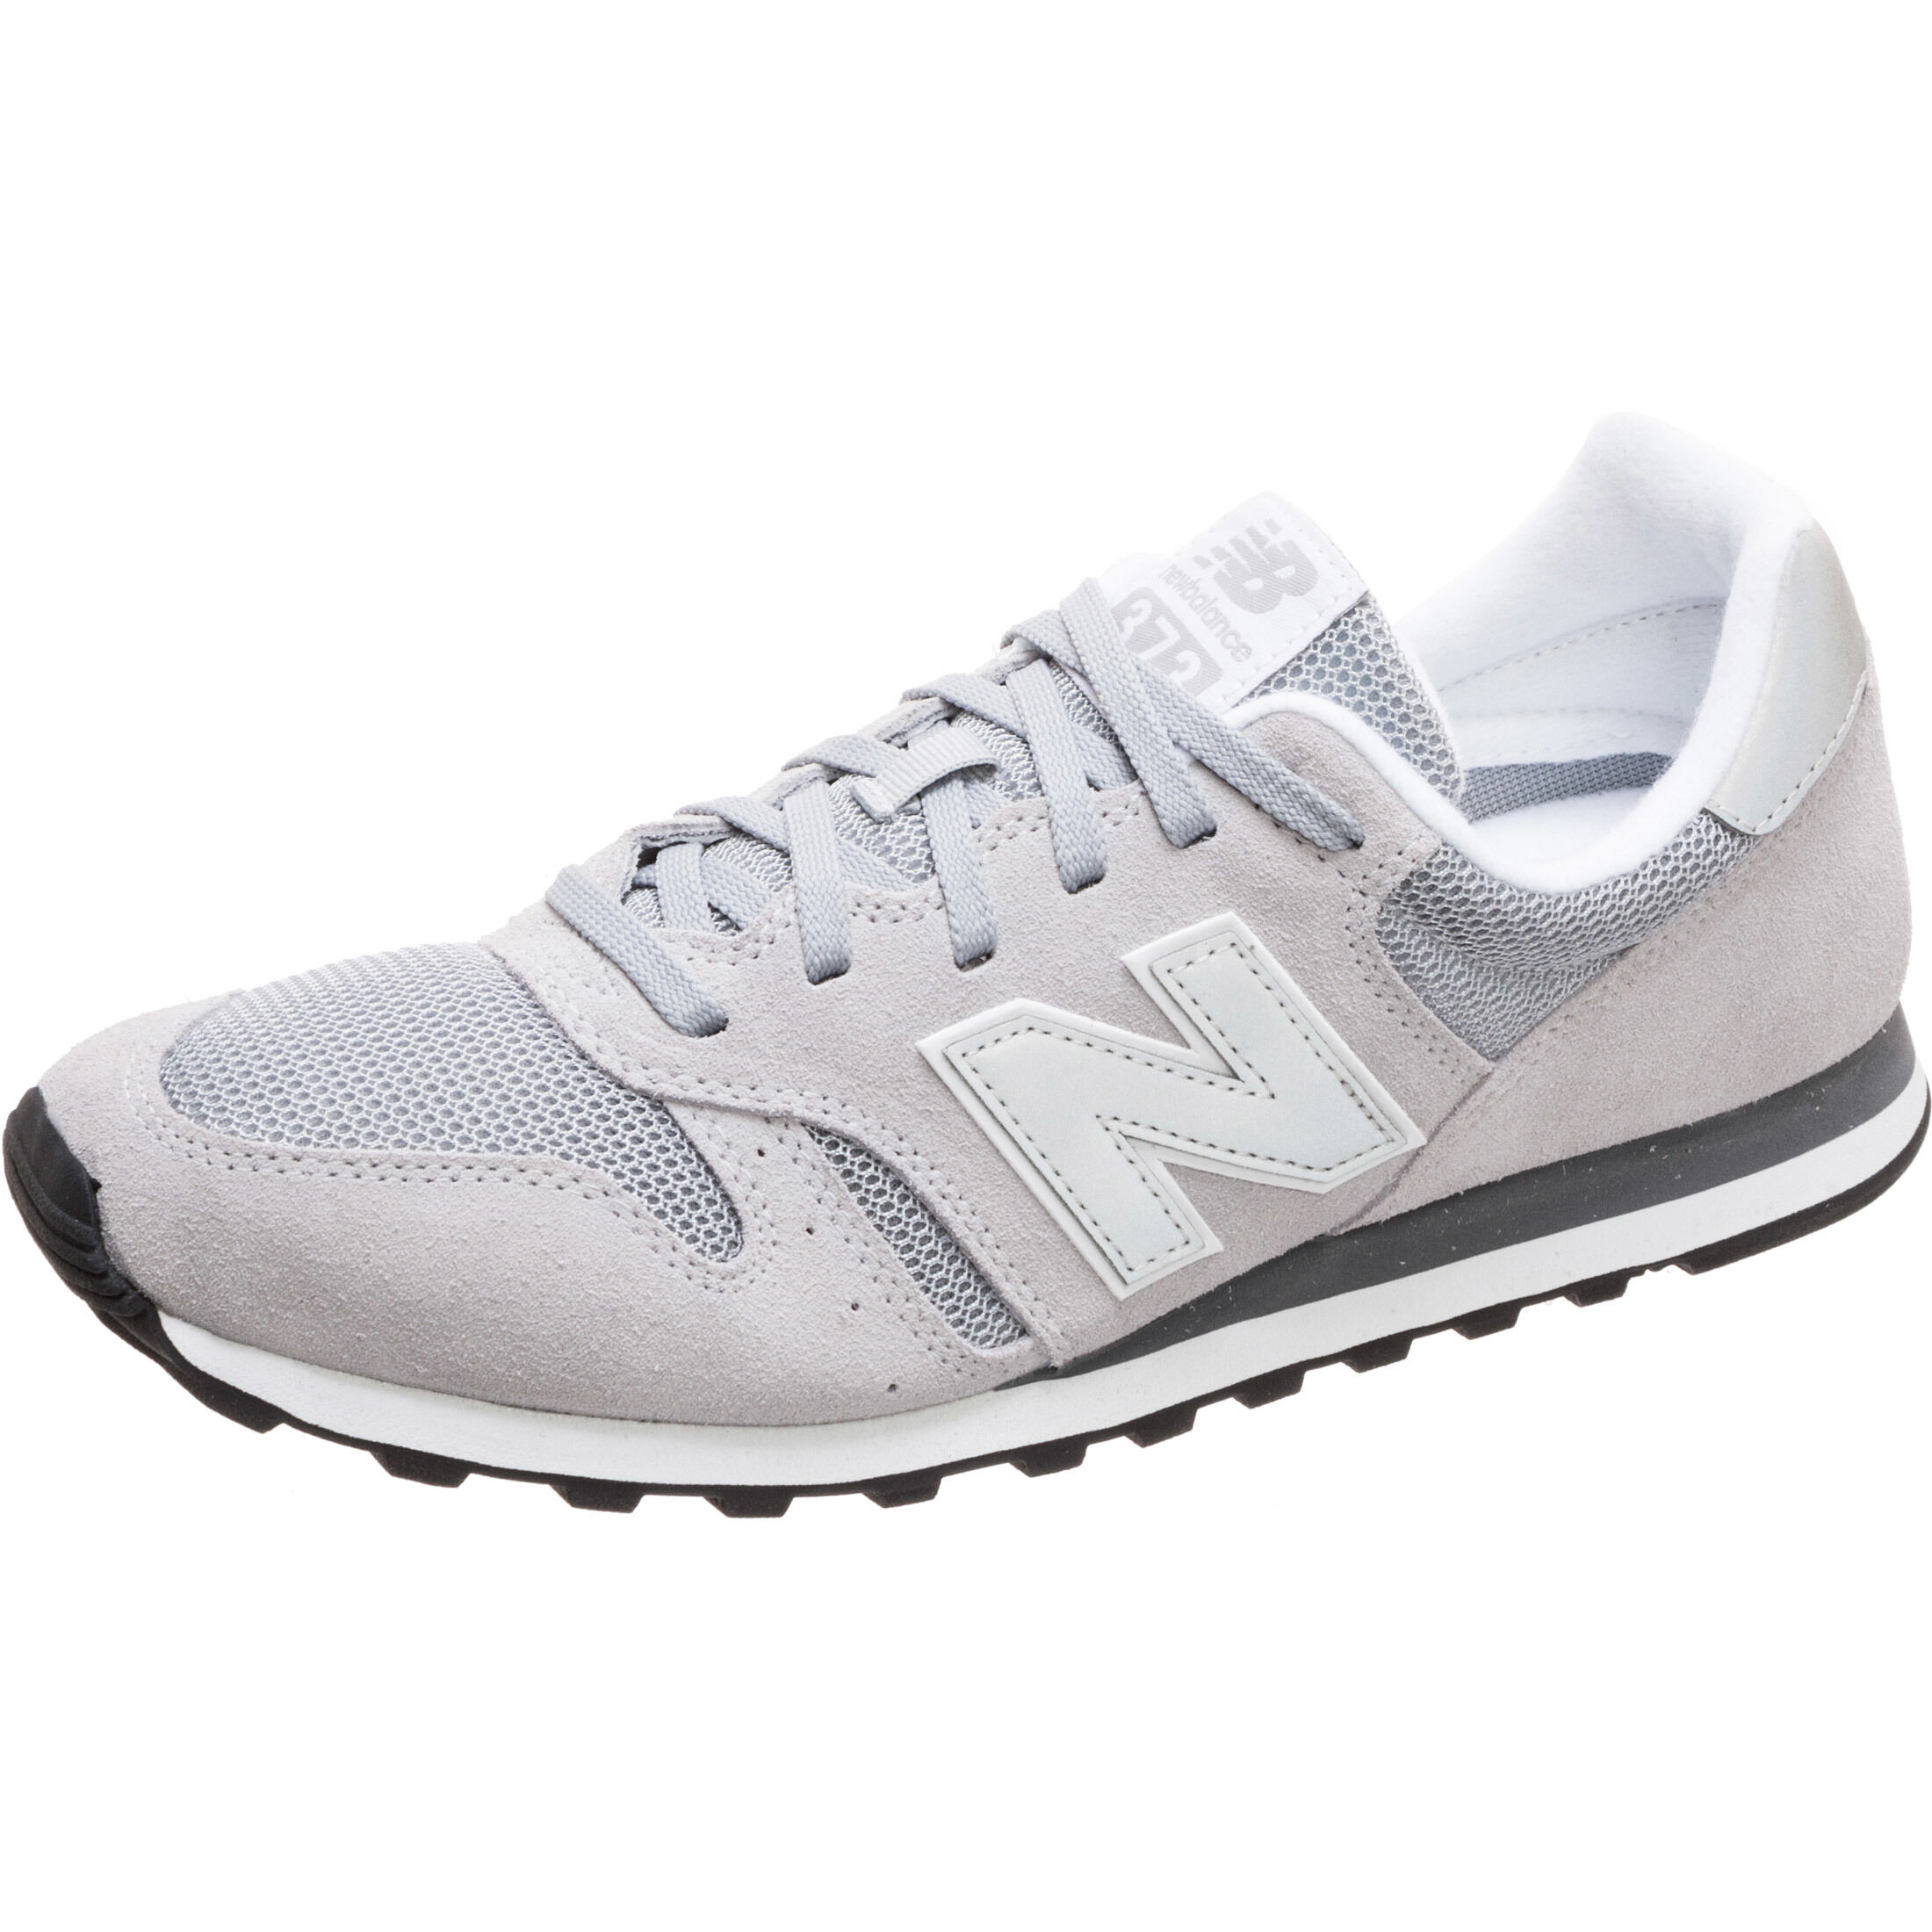 New Balance Sneaker Herren | Sneaker Shop Lifestyle bei